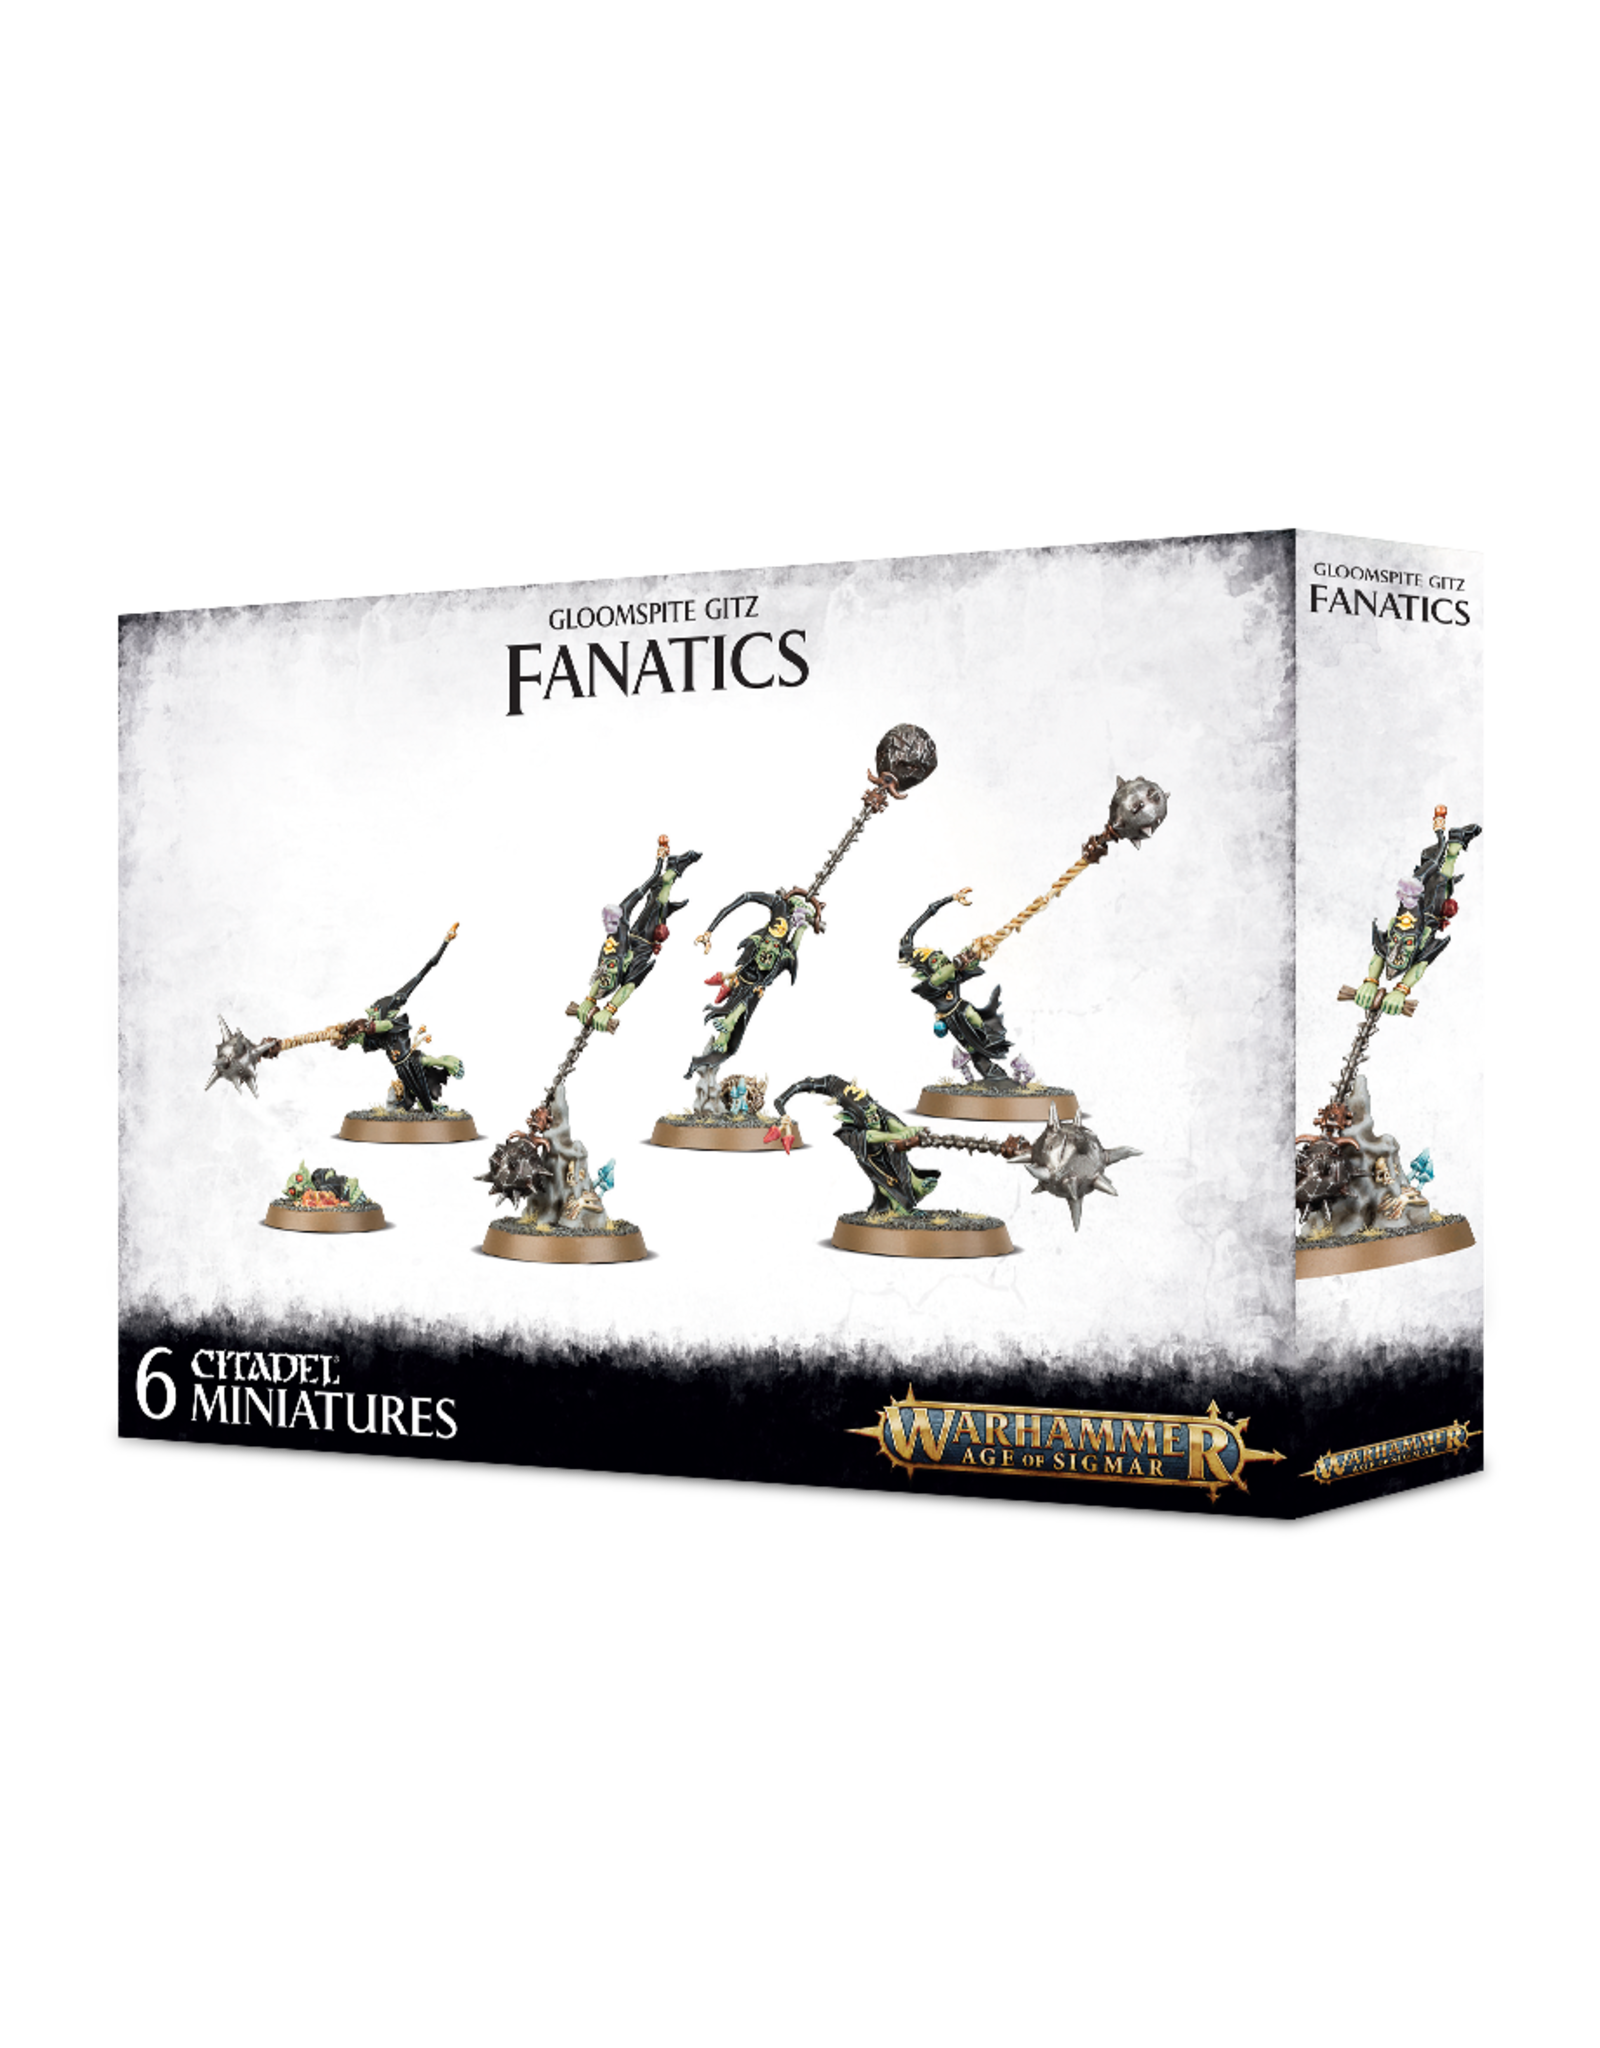 Games-Workshop GLOOMSPITE GITZ: FANATICS